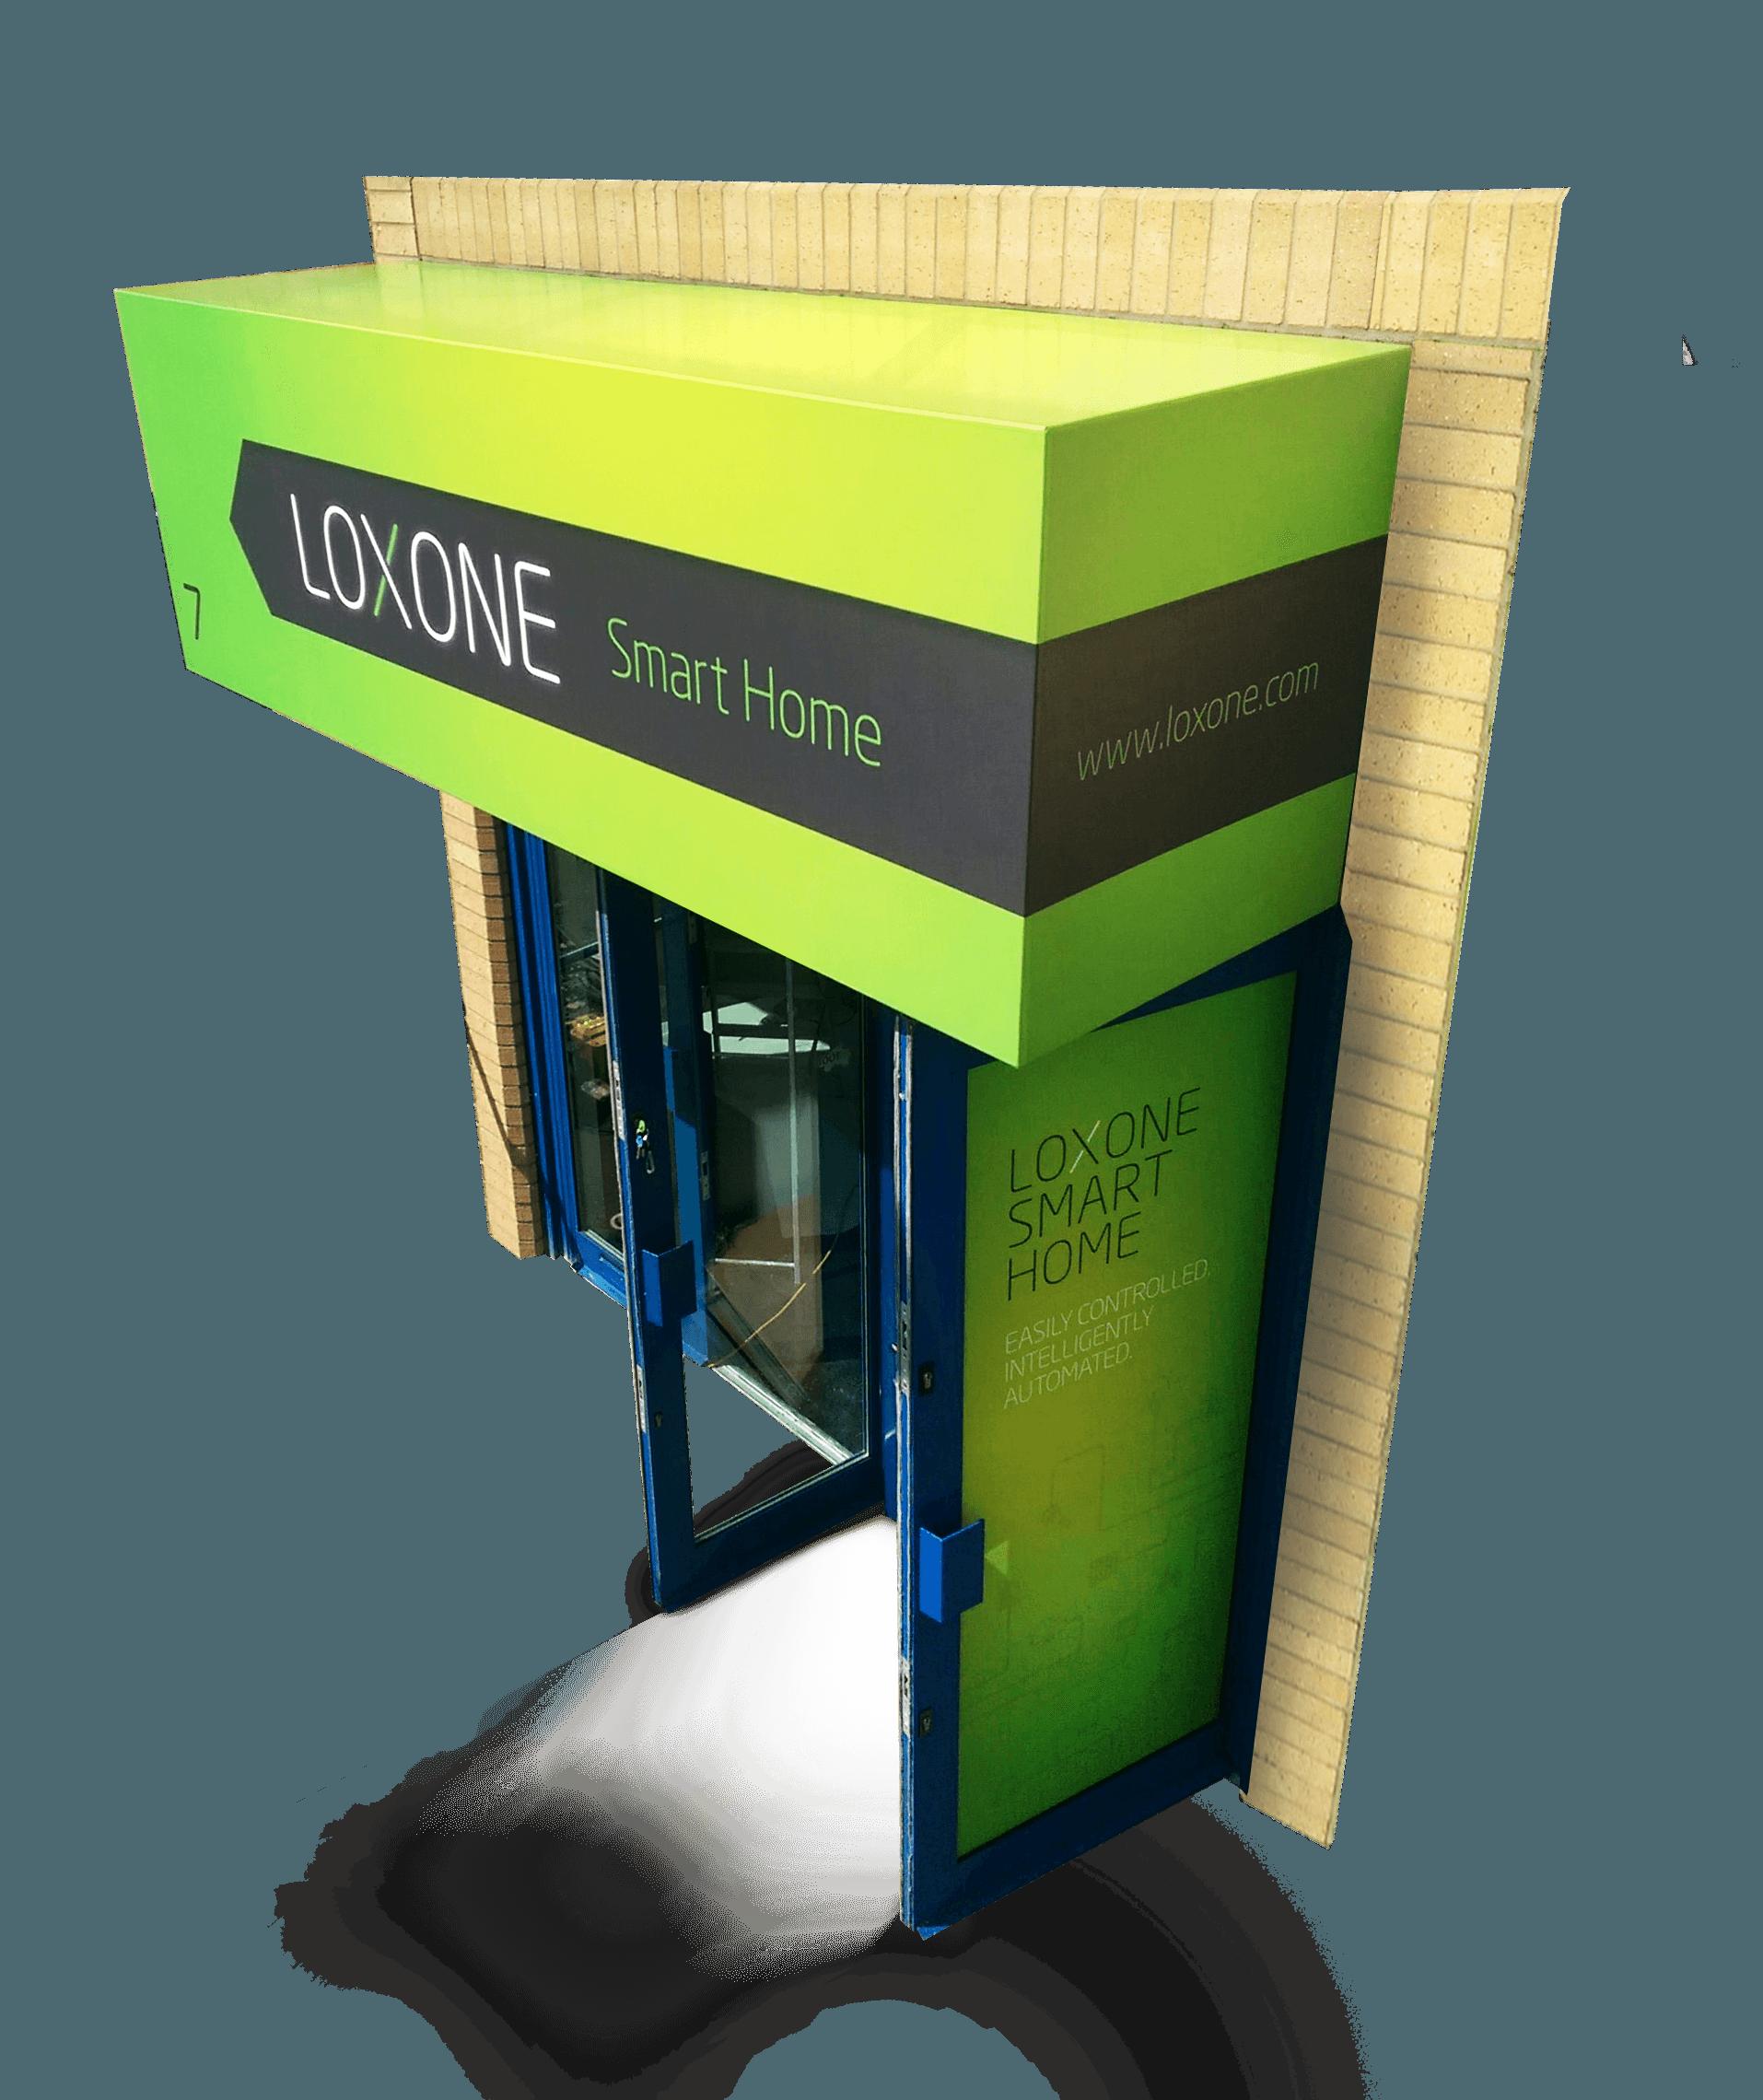 Loxone Smart Home graphics